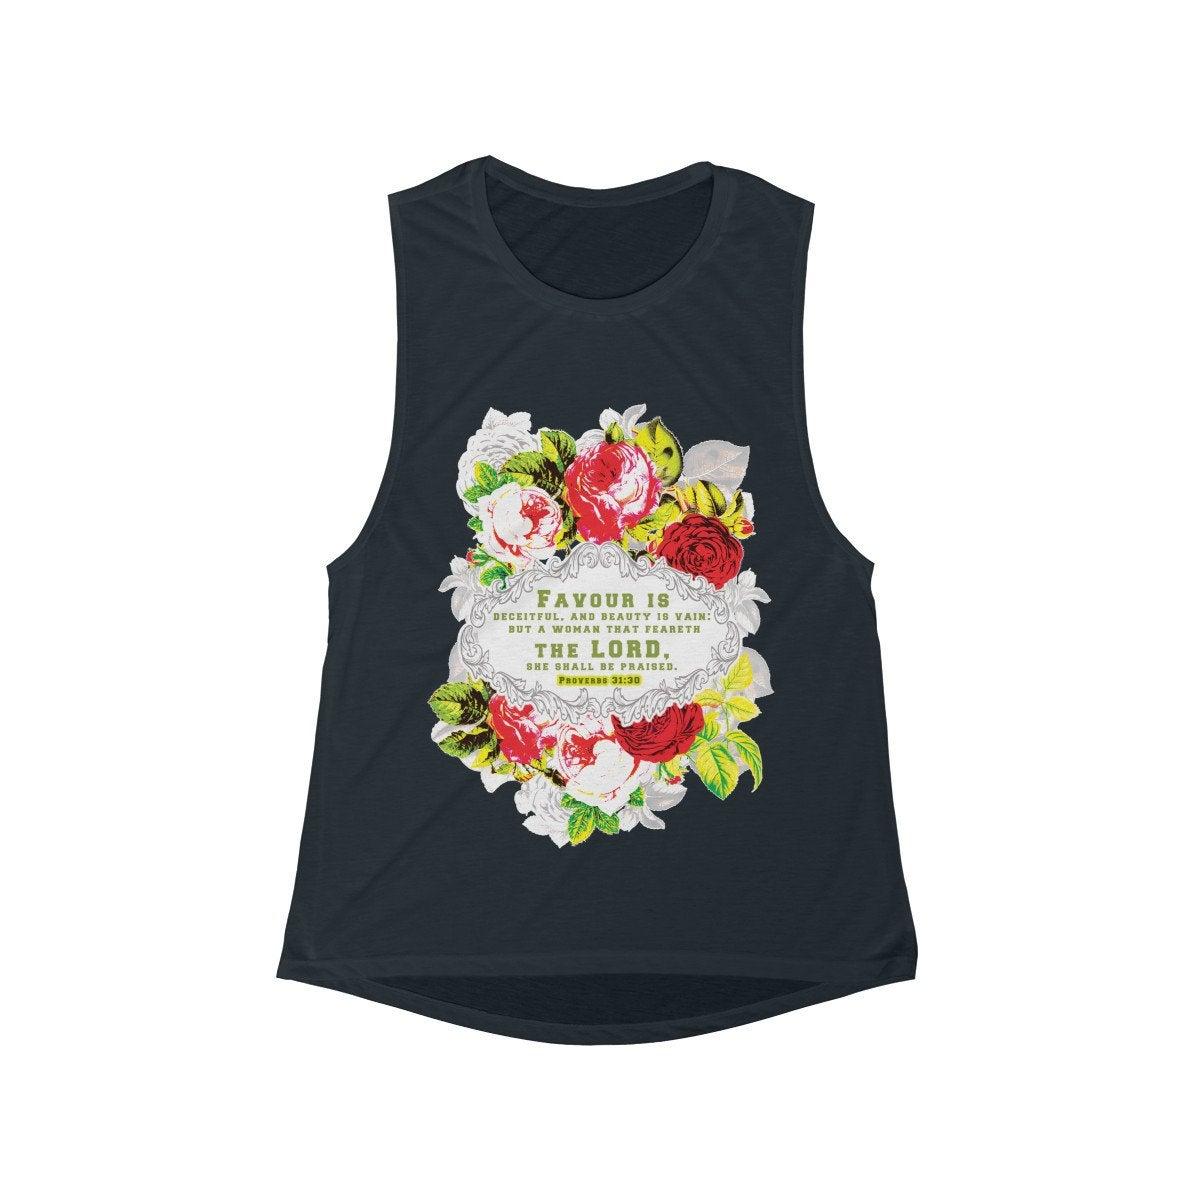 Proverb 31 Women's short sleeve t-shirt christian scripture tee https://t.co/5CHLi173TM #truebluedesignco #Etsy https://t.co/o3eDtF6AZx